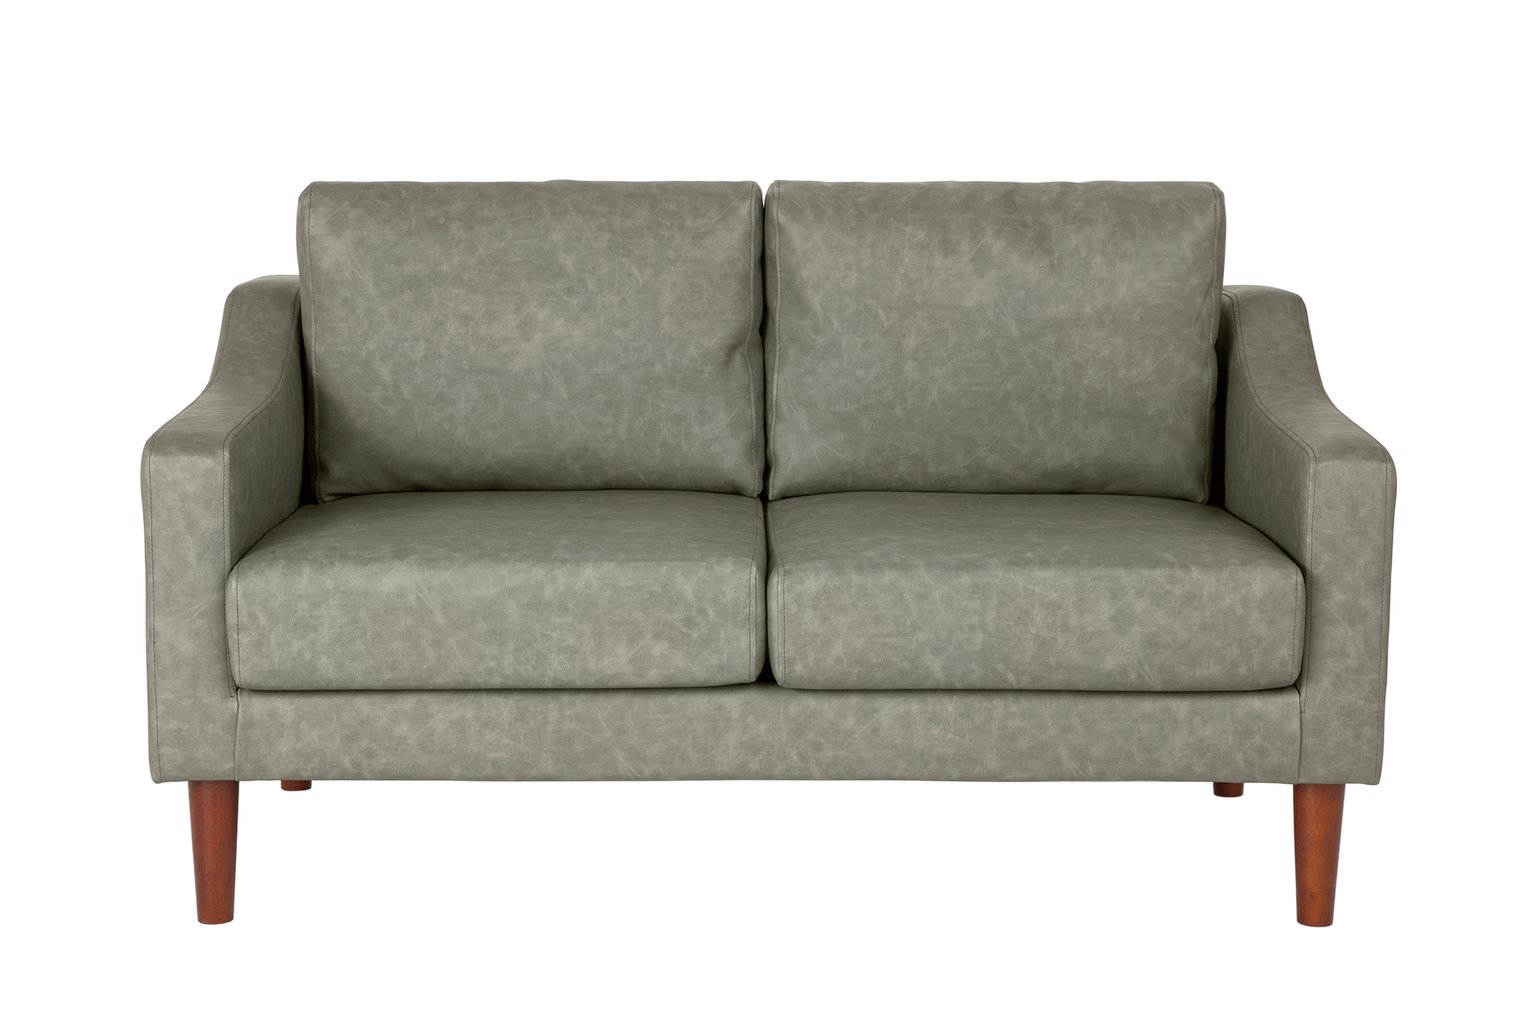 Argos Home Brixton 2 Seater Faux Leather Sofa - Soft Grey